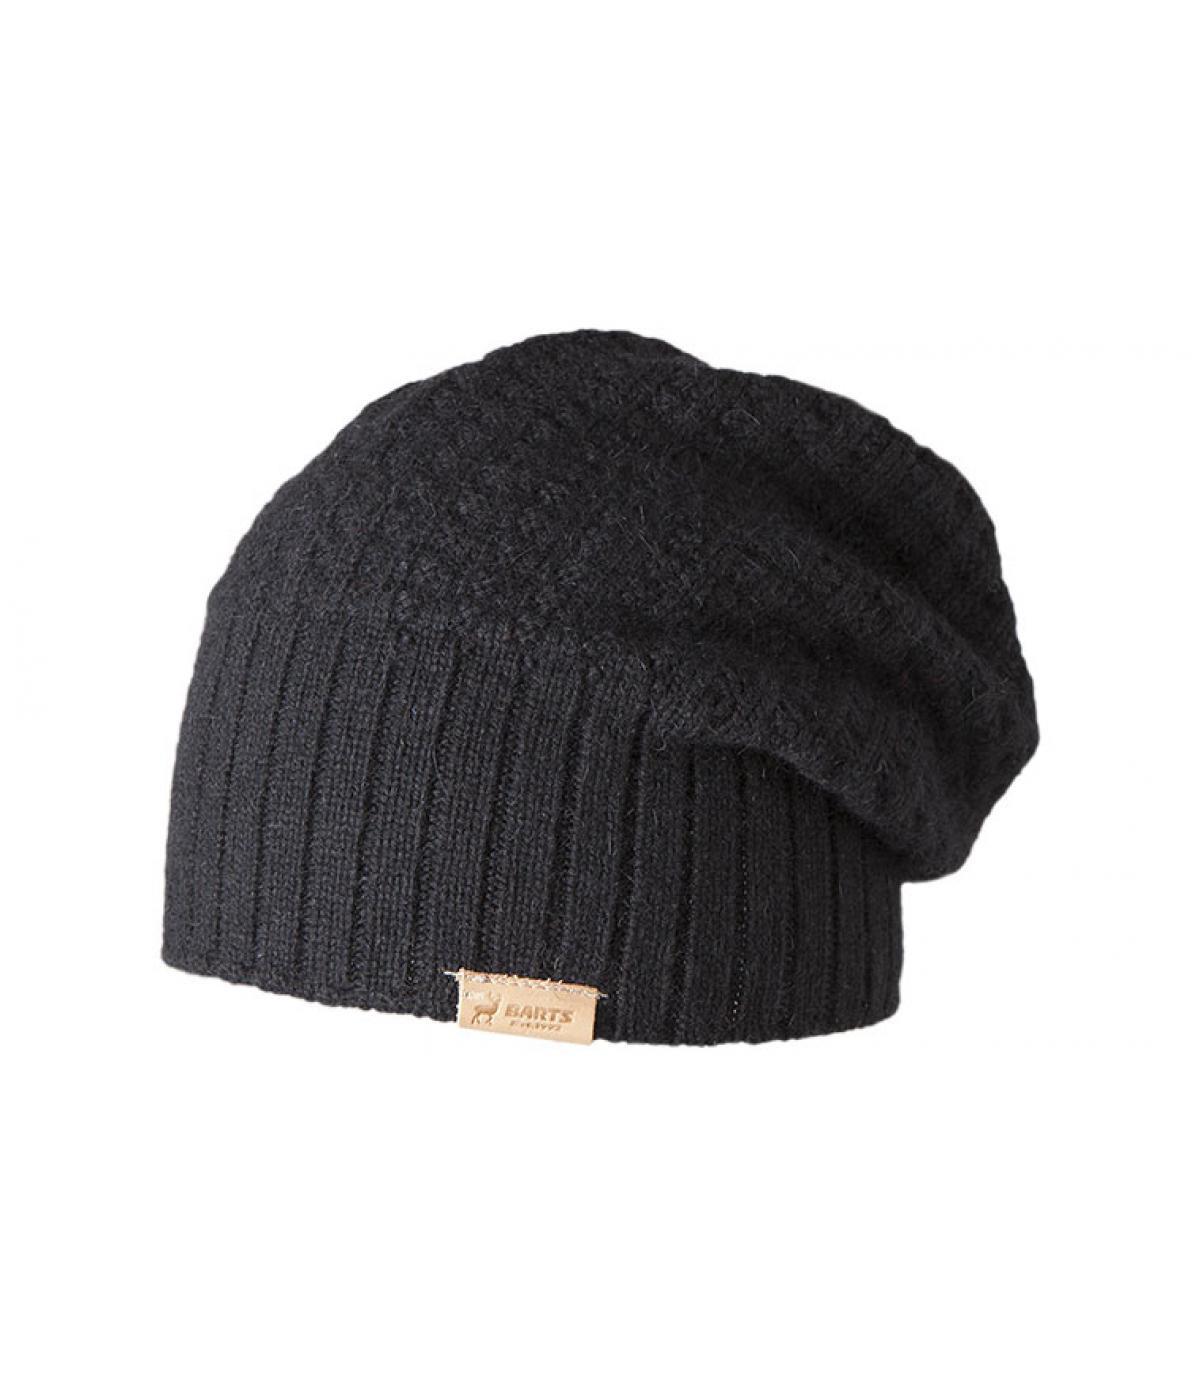 Details Schwarze Mütze Hudson  - Abbildung 3